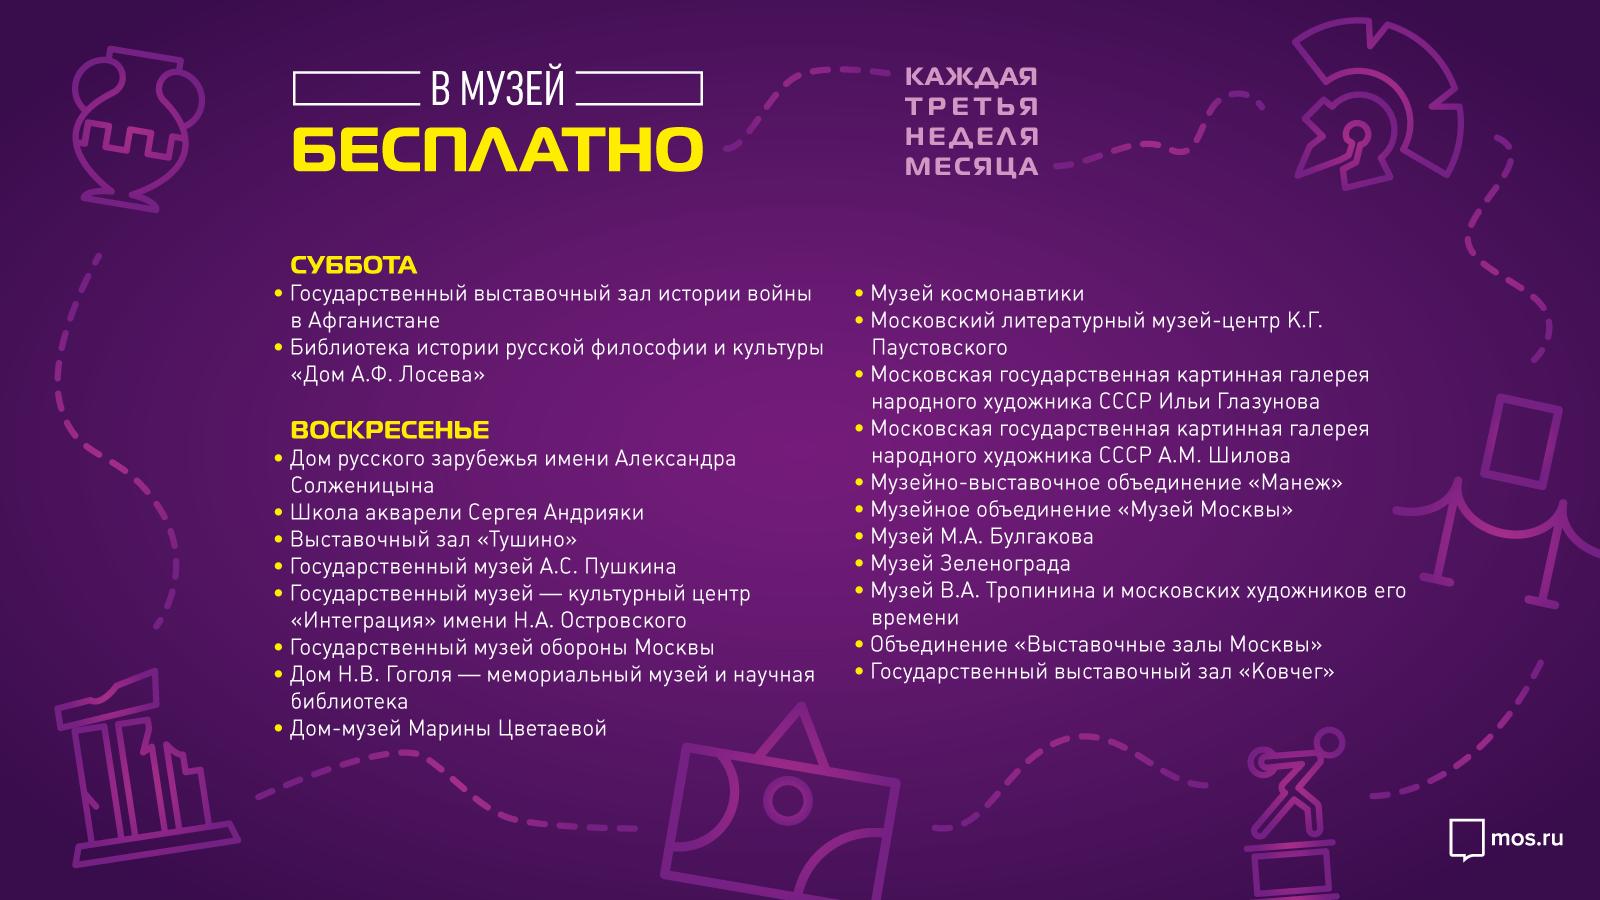 https://www.mos.ru/upload/newsfeed/newsfeed/museum2020_1_1600x900.png